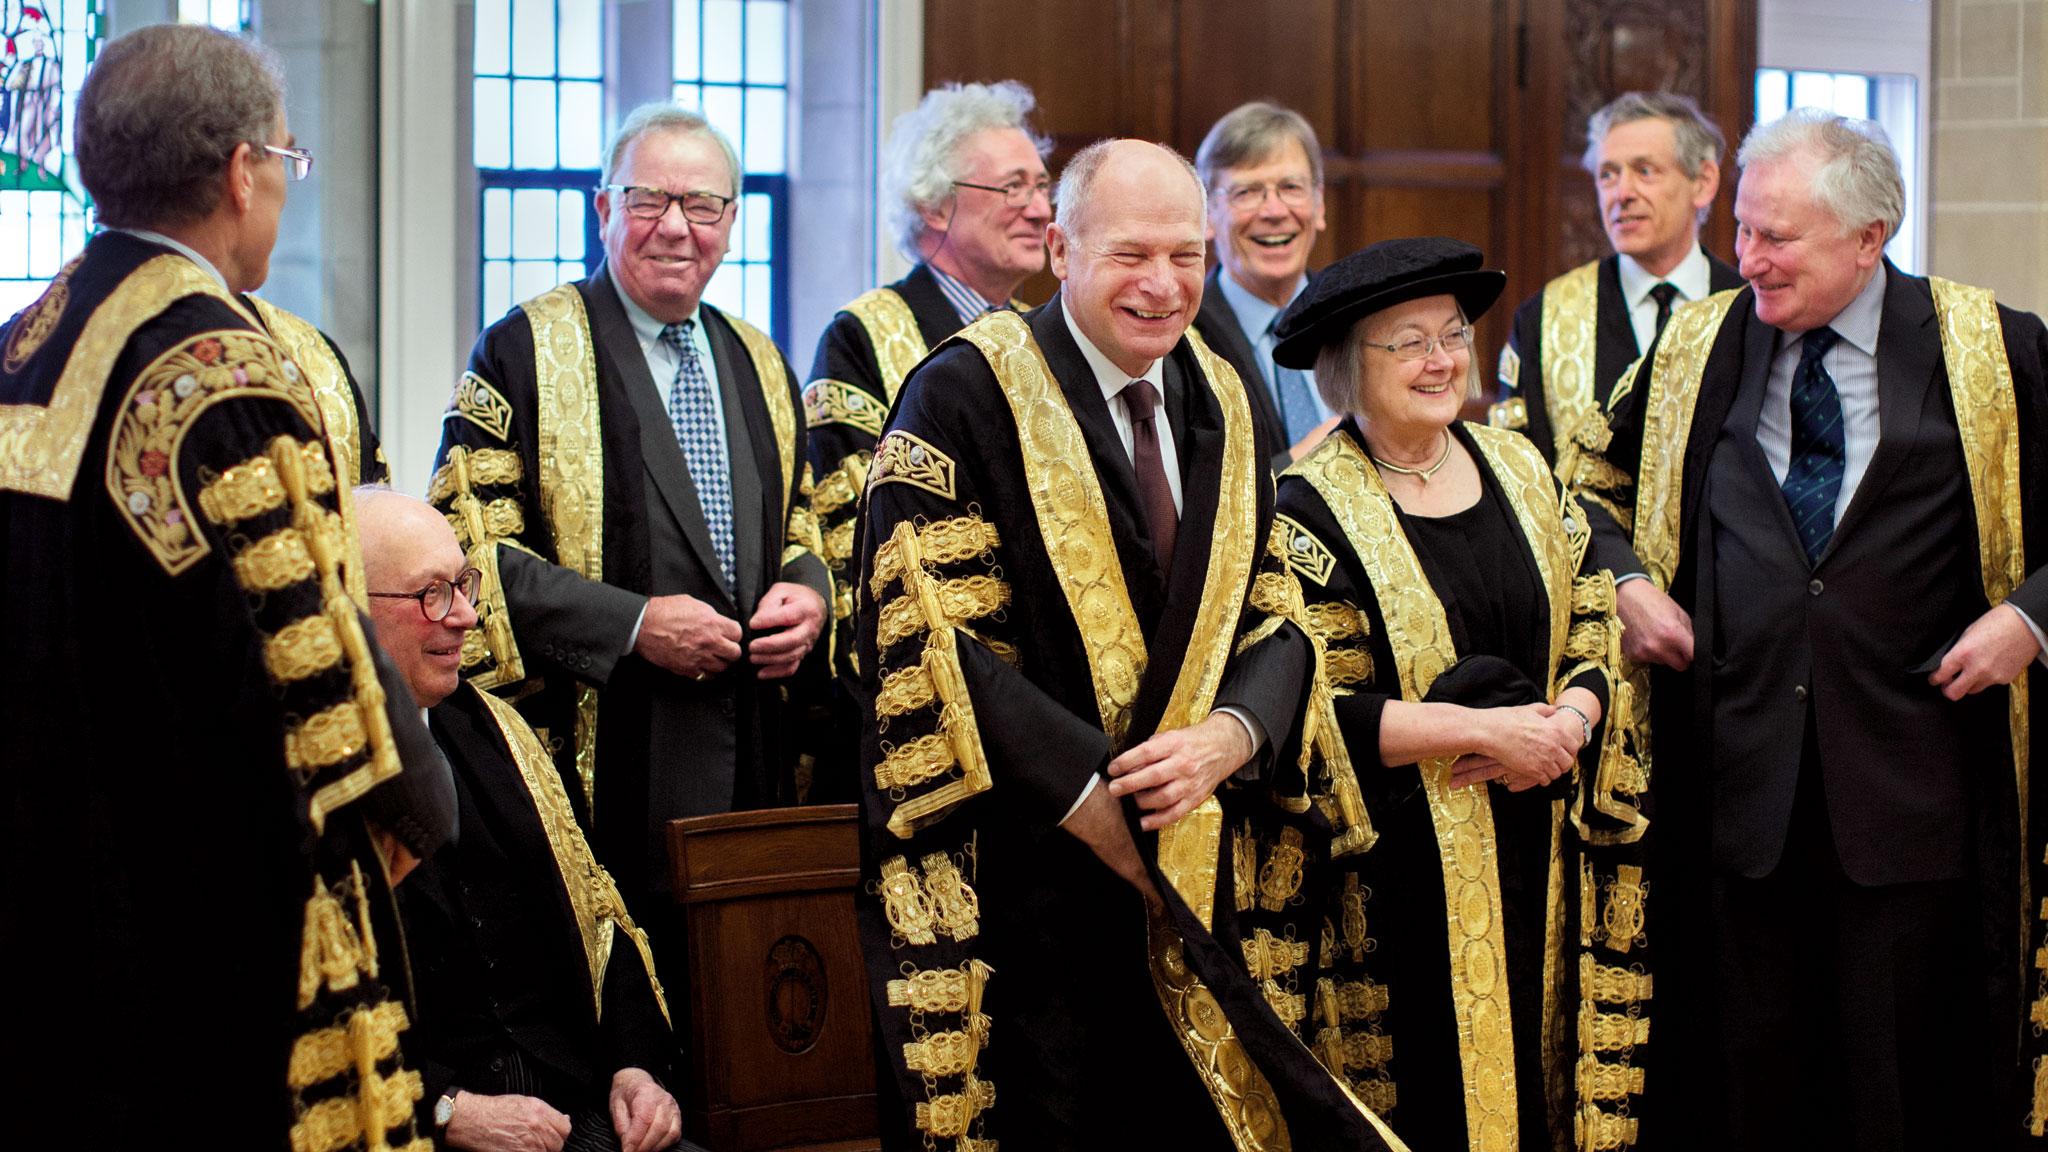 british institutions: the supreme court